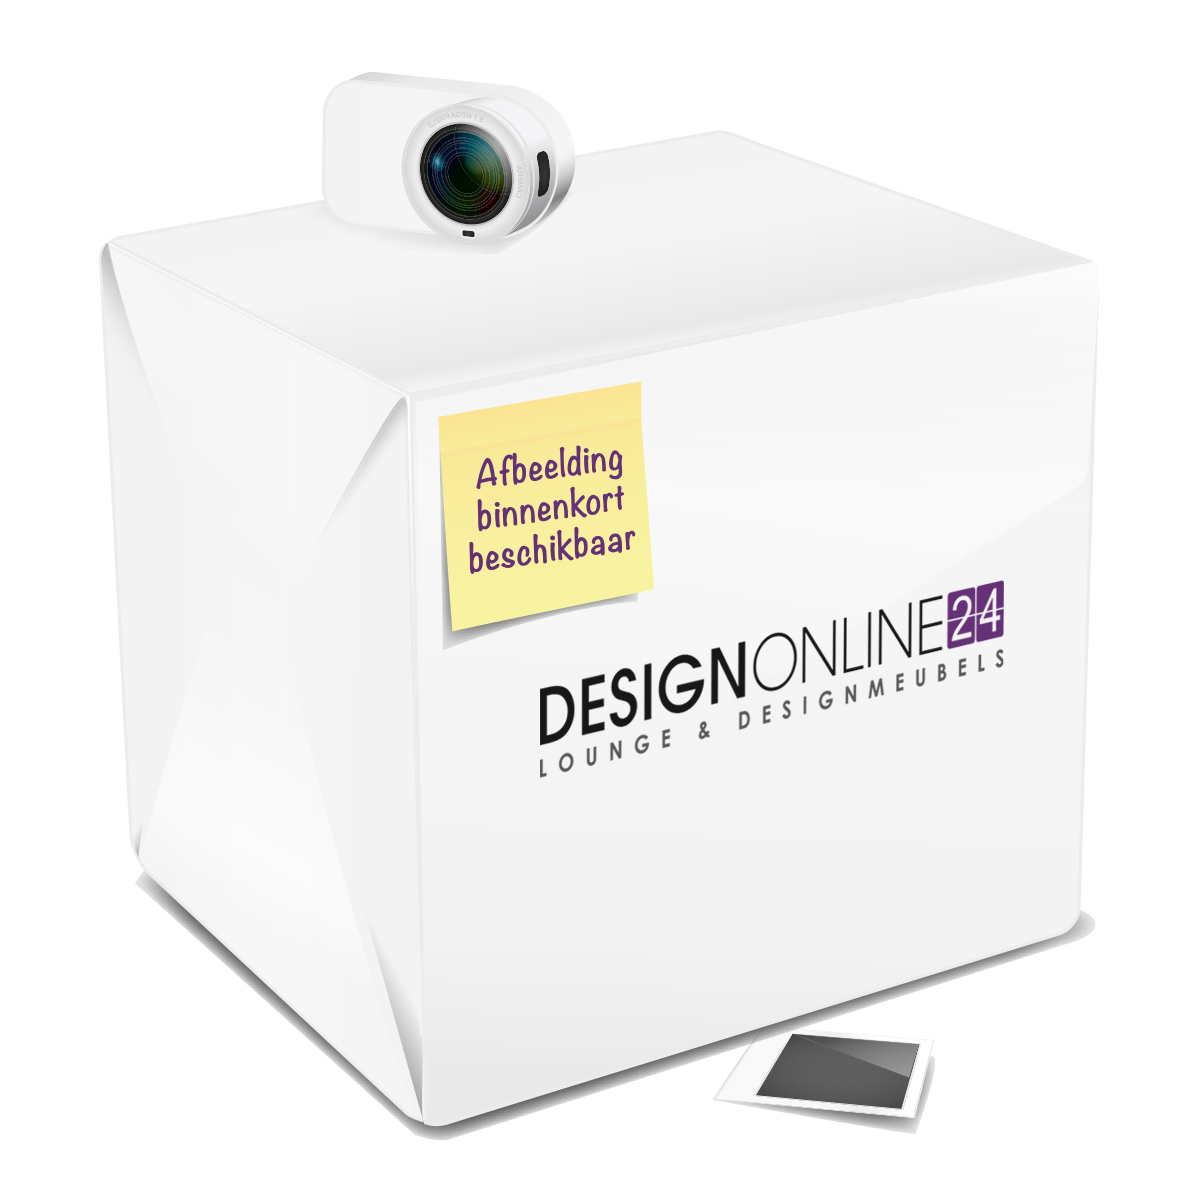 Innovation Slaapbank Cubed 140 Deluxe - Chromen Poten - Leatherlook 588 - Wit